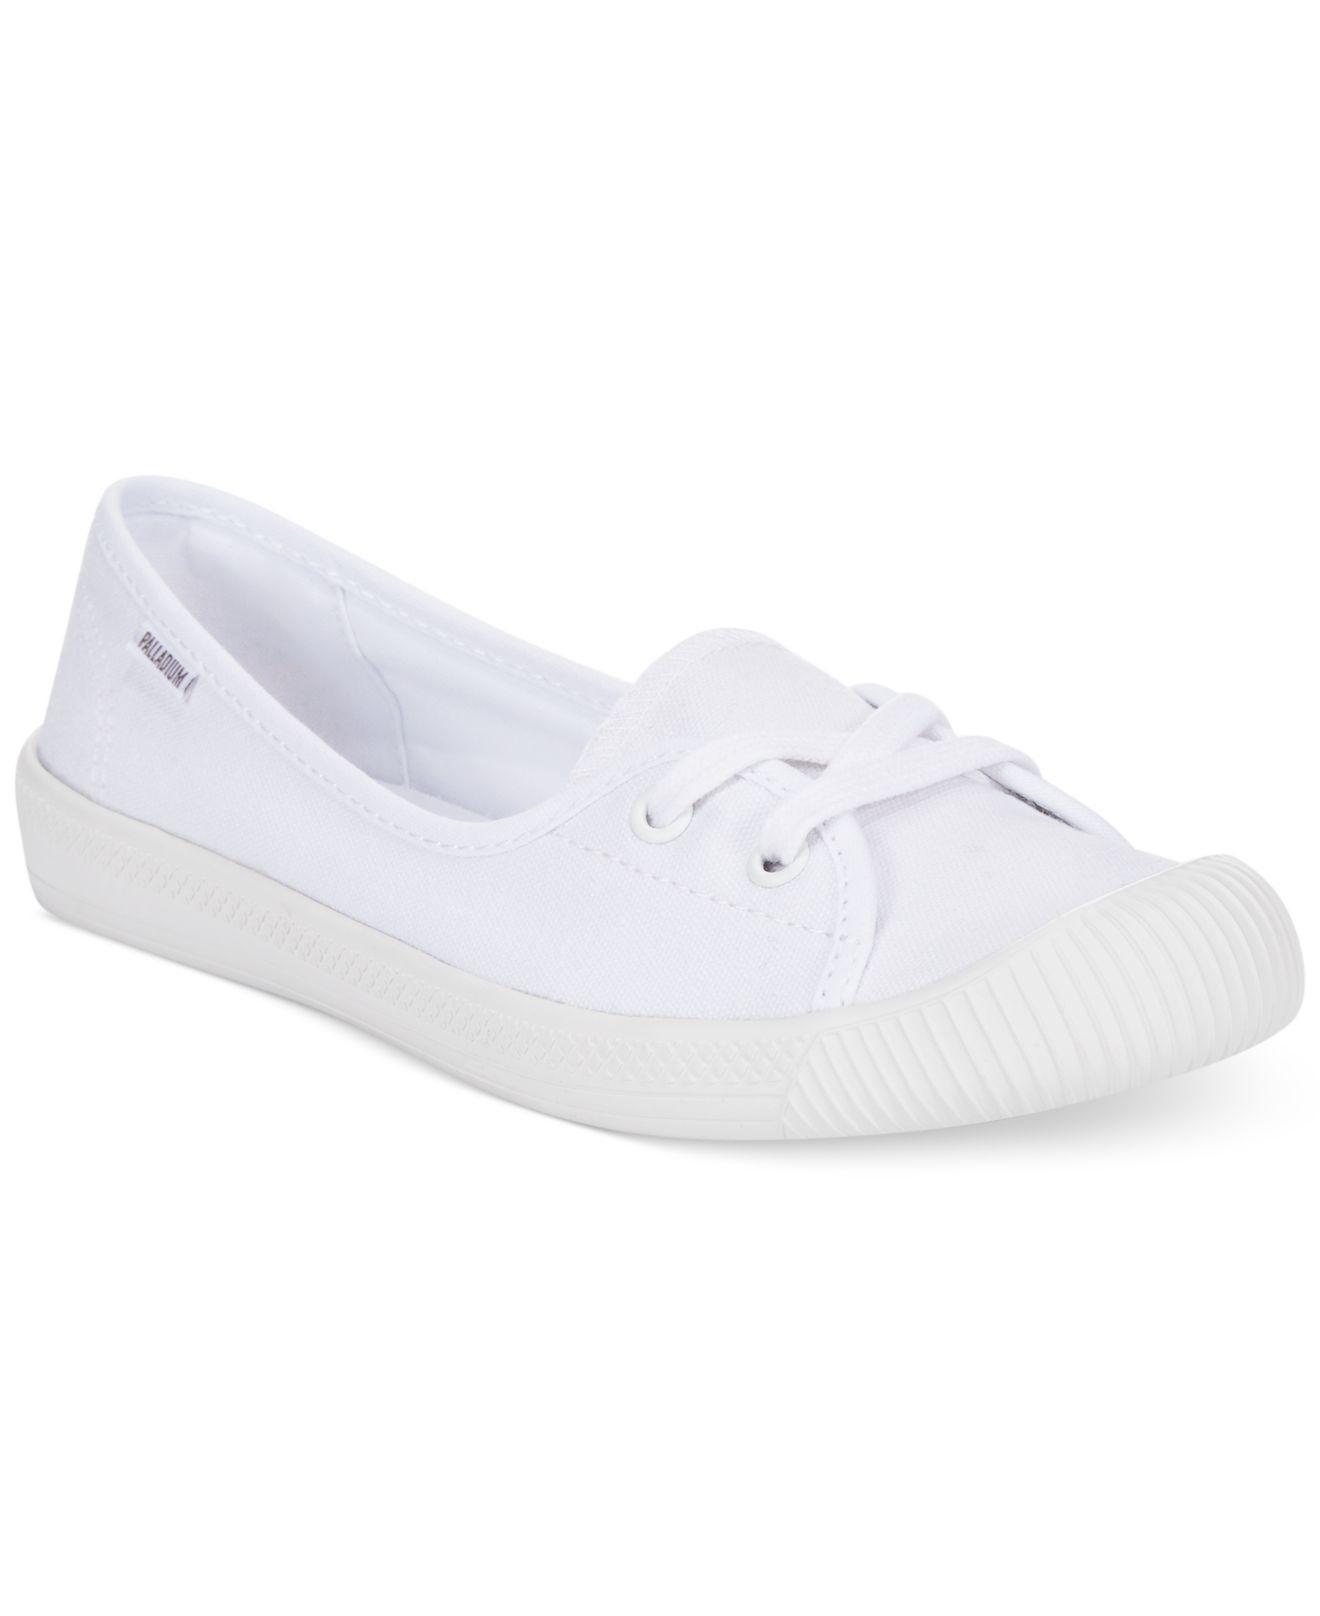 Flex Ballet Flat Sneakers